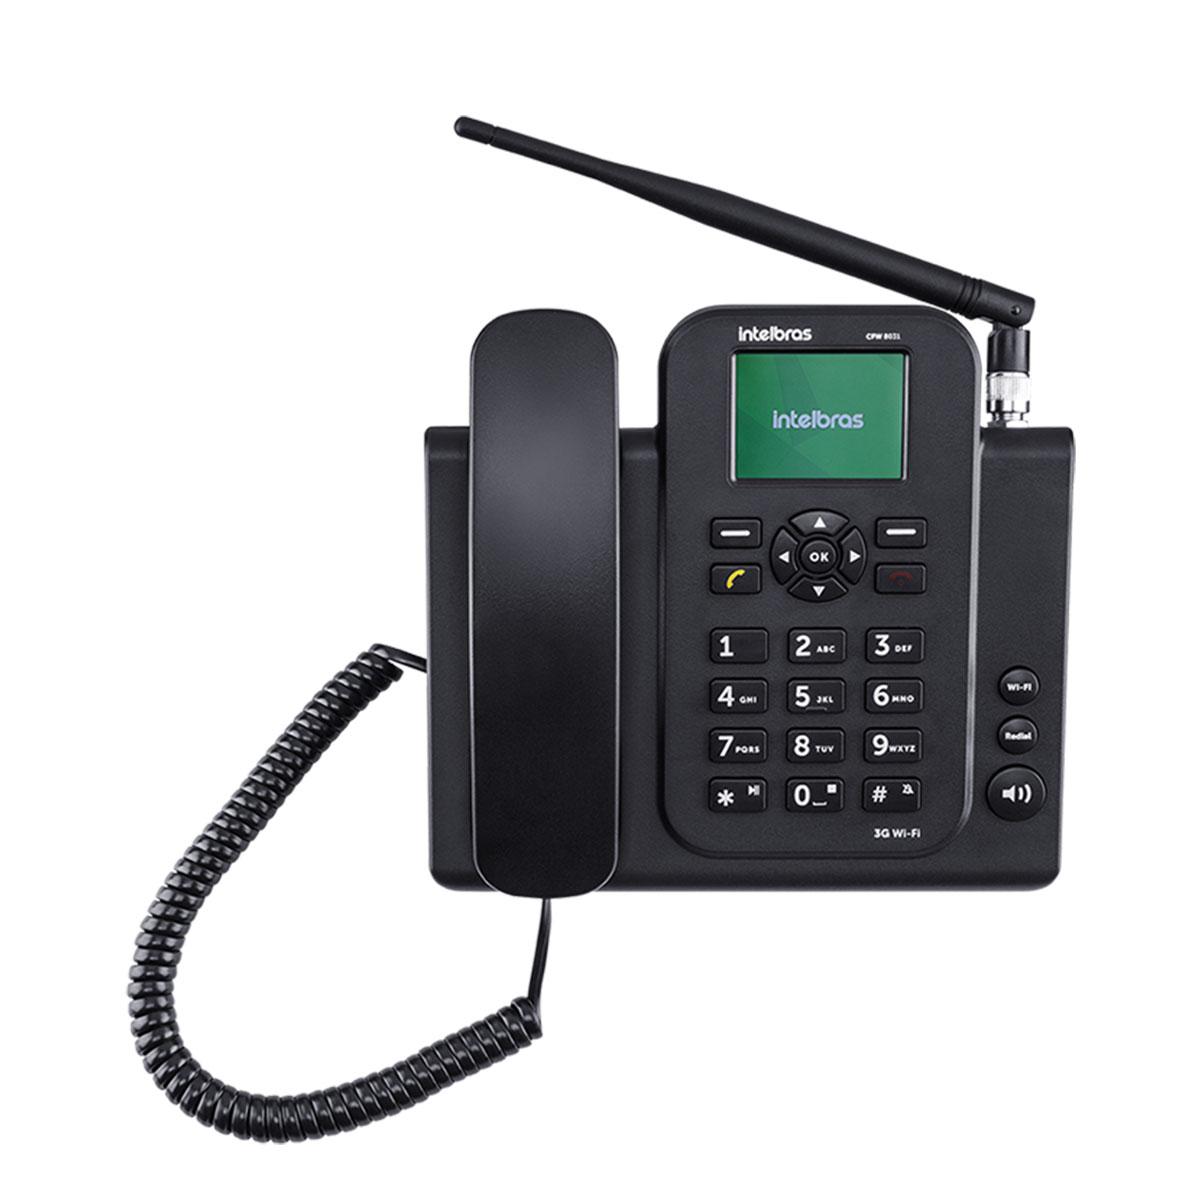 TELEFONE CELULAR FIXO 3G WIFI CFW 8031 4118031  - Audio Video & cia